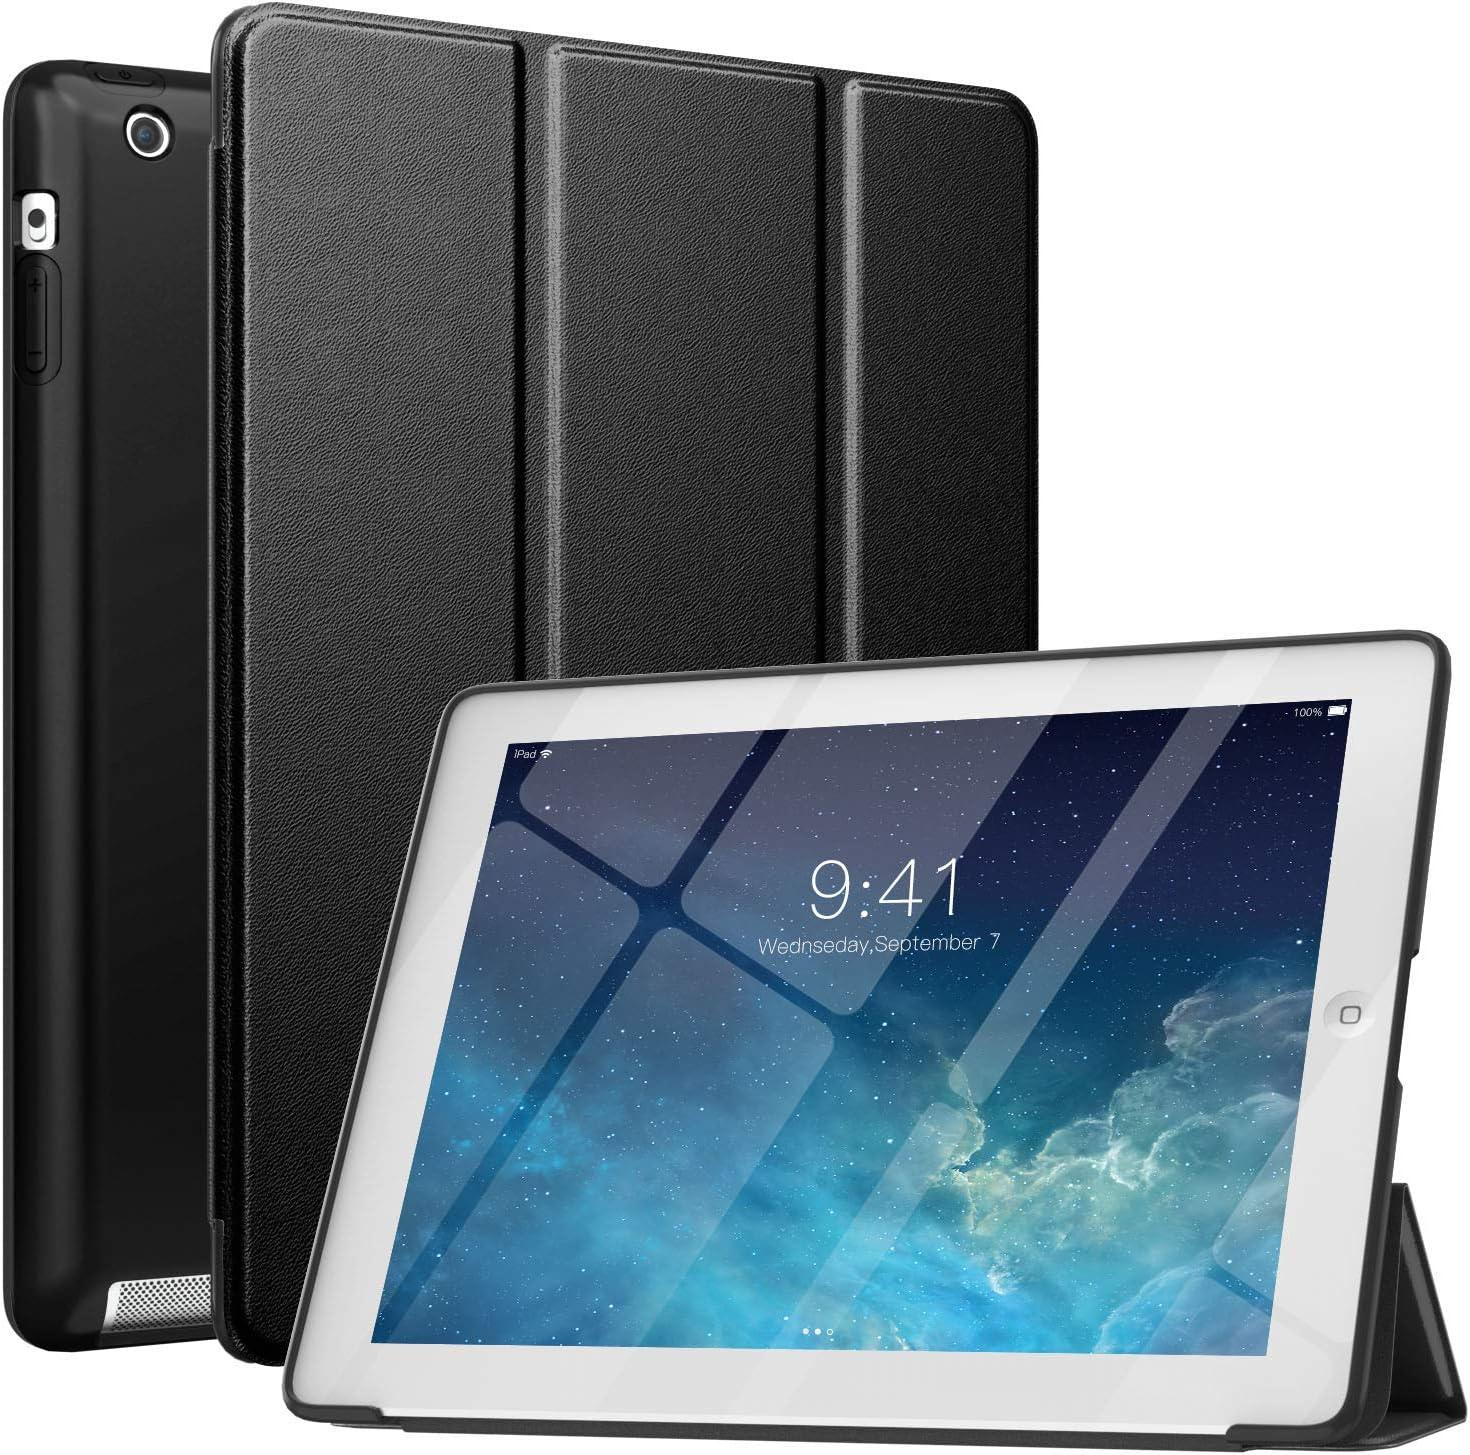 MoKo Case Fit iPad 2/3/4, Slim Smart Shell Stand Folio Case with Soft TPU Back Cover Compatible with iPad 2/The New iPad 3 (3rd Gen)/iPad 4, Auto Wake/Sleep - Black